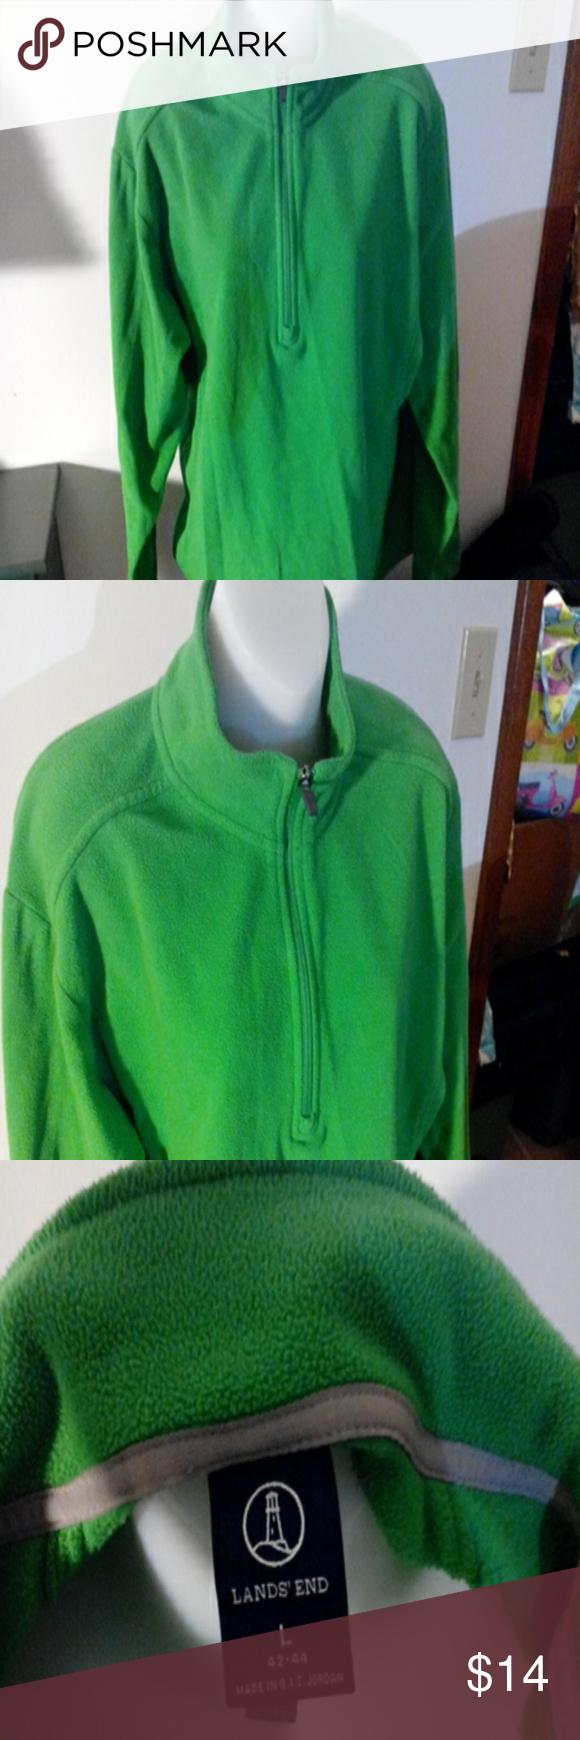 Lands End Large Green Sweatshirt Sweatshirts Green Sweatshirt Clothes Design [ 1740 x 580 Pixel ]